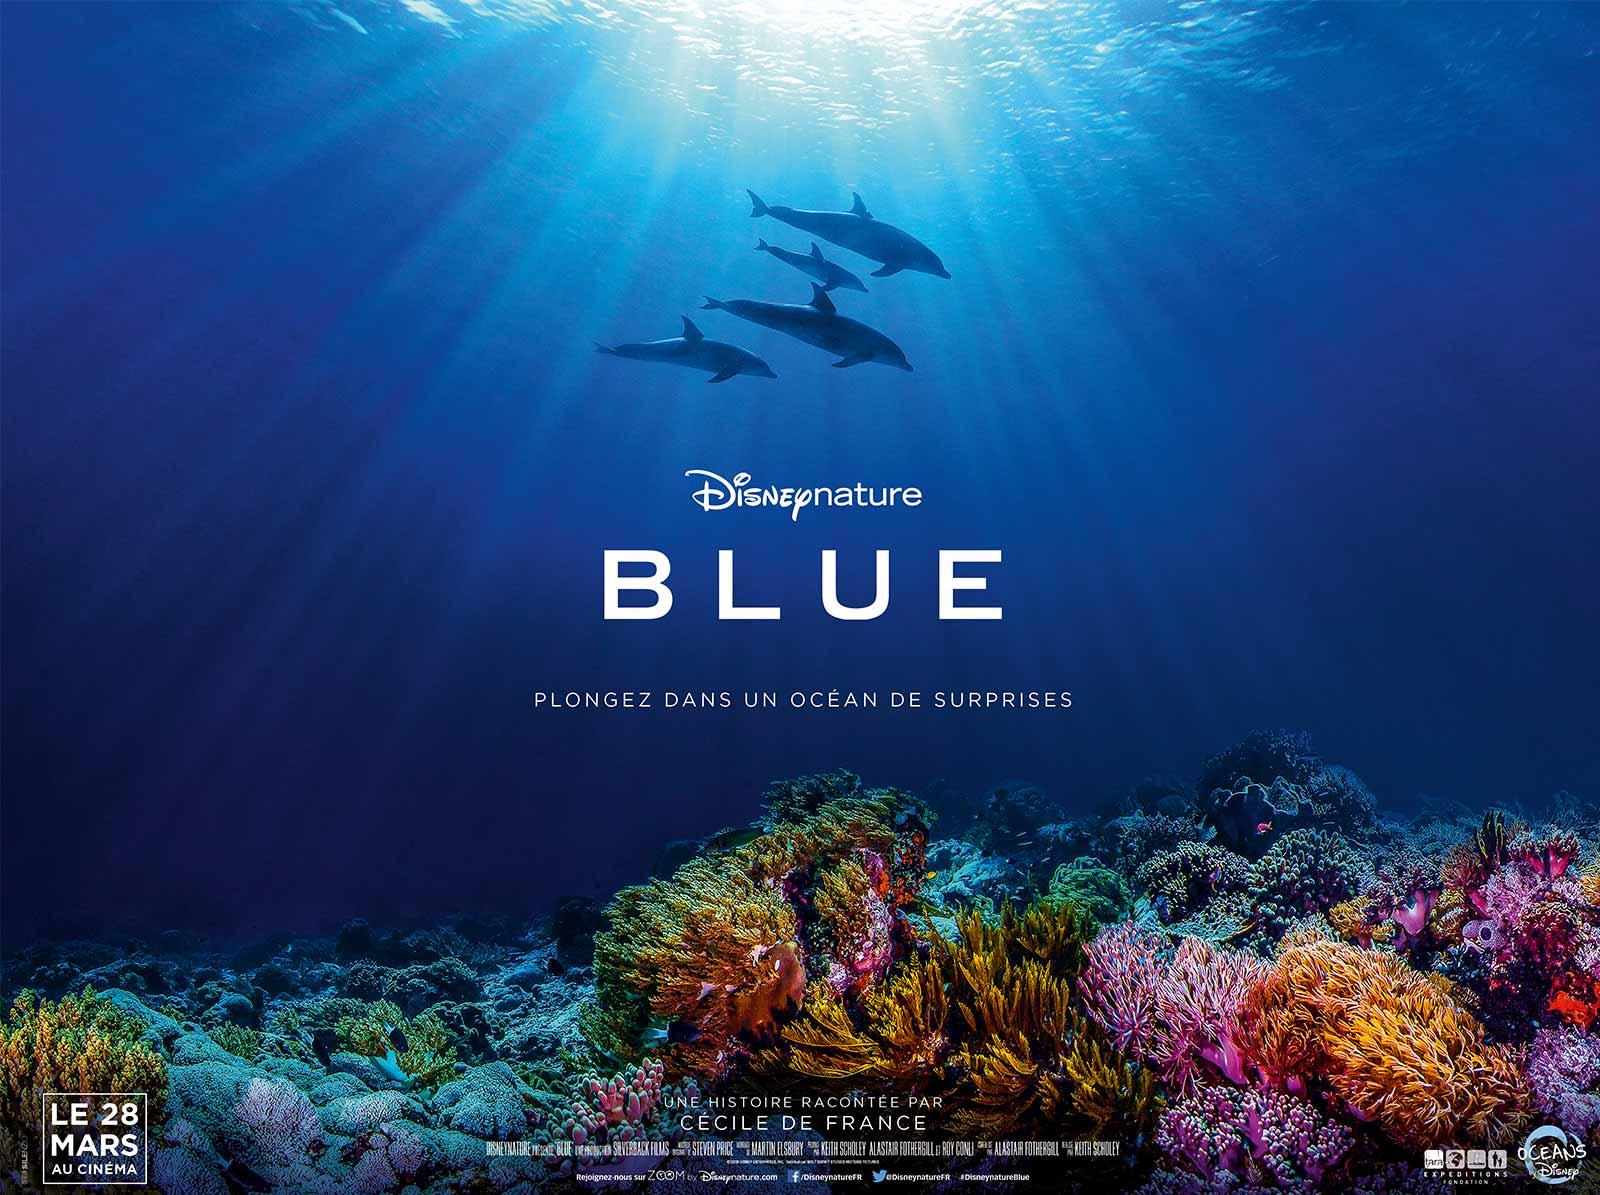 blue disney nature